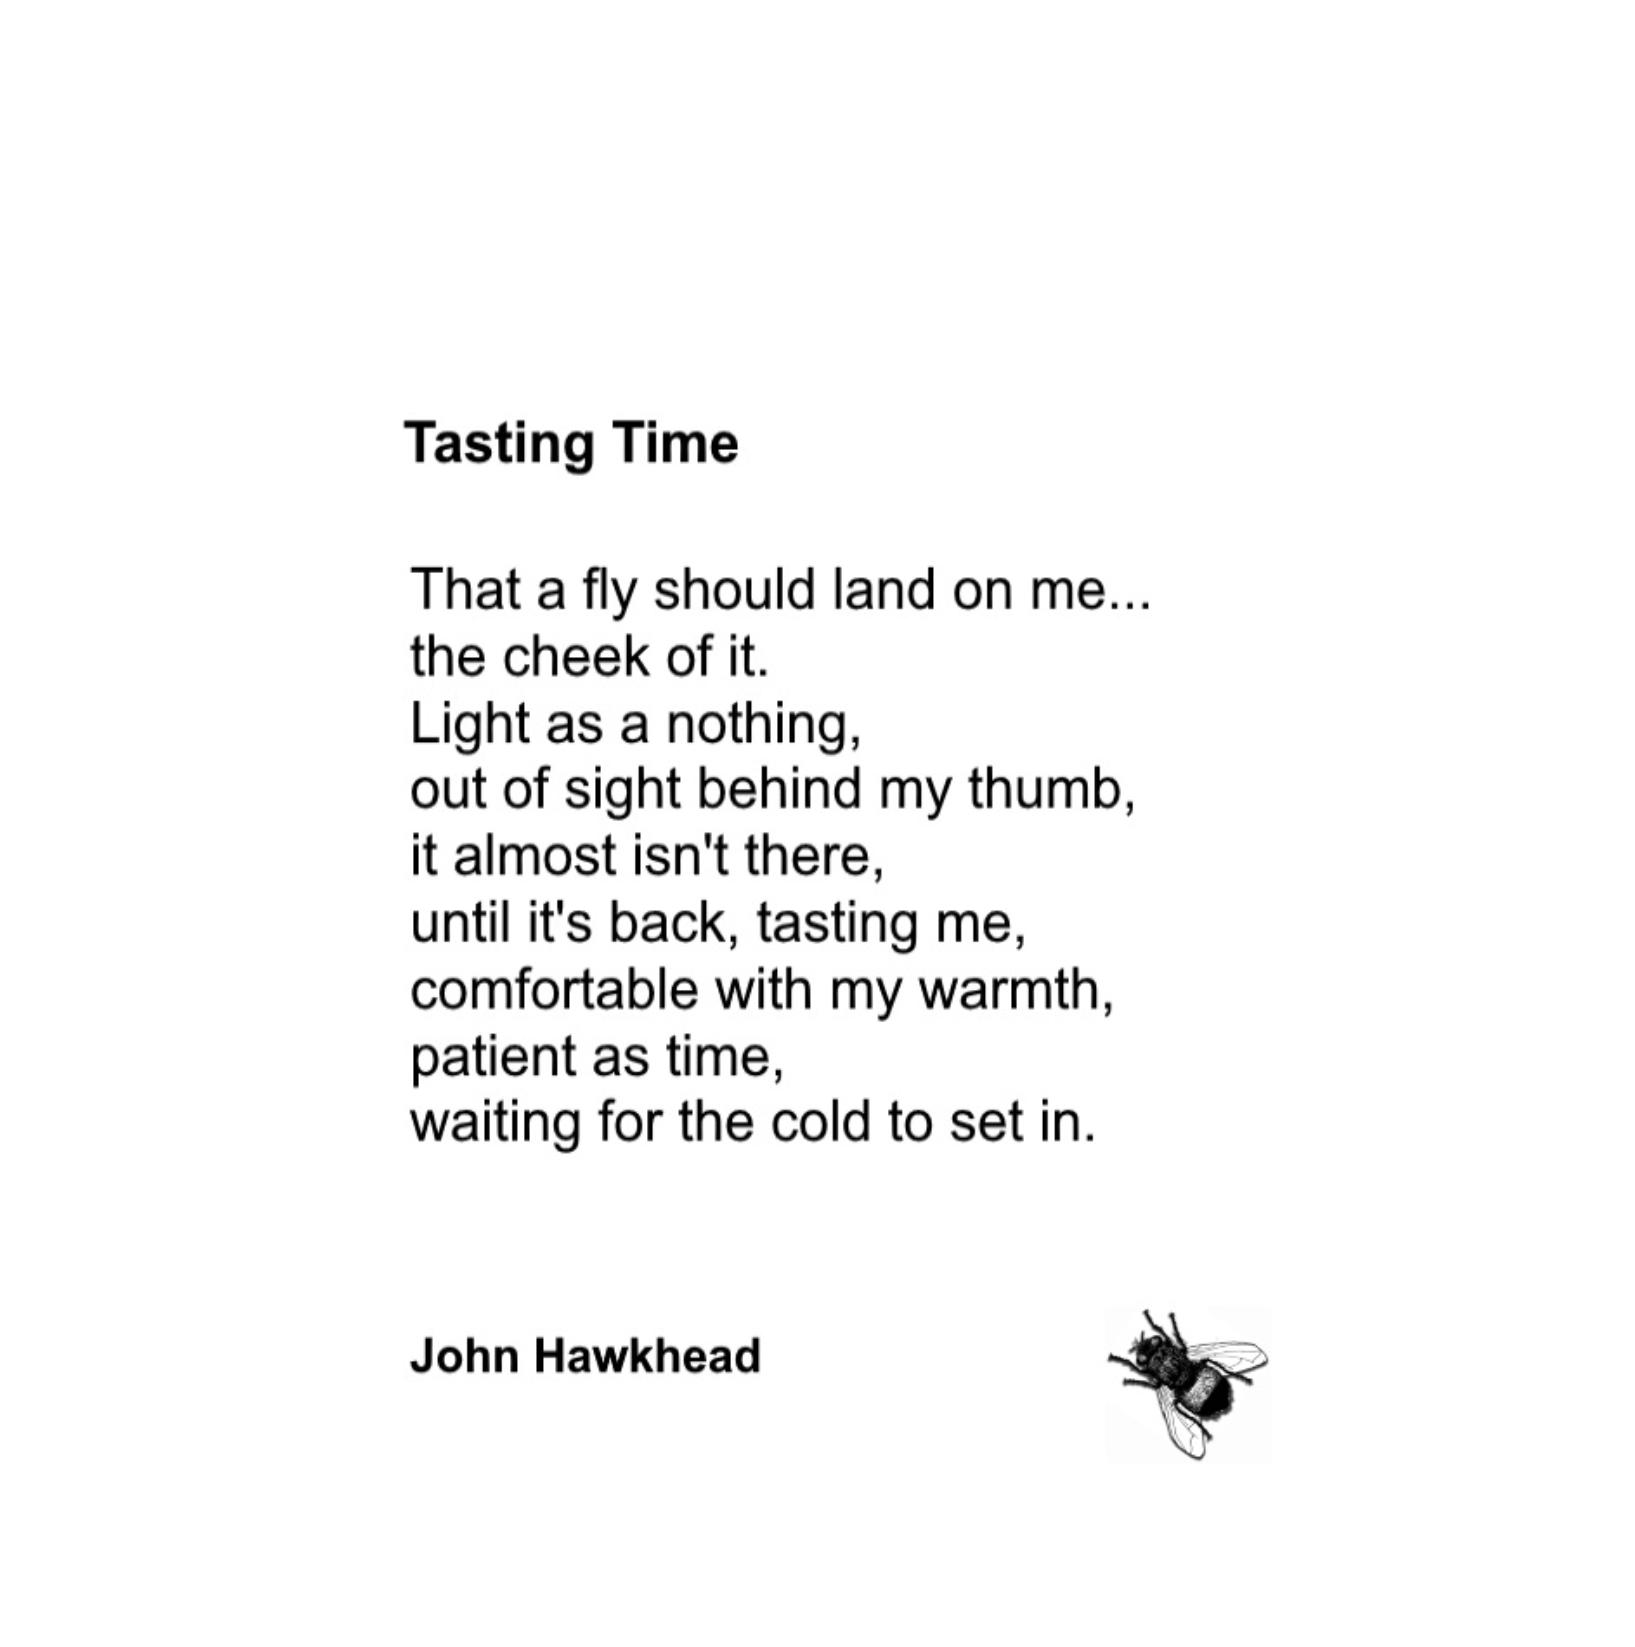 Tasting Time by John Hawkhead